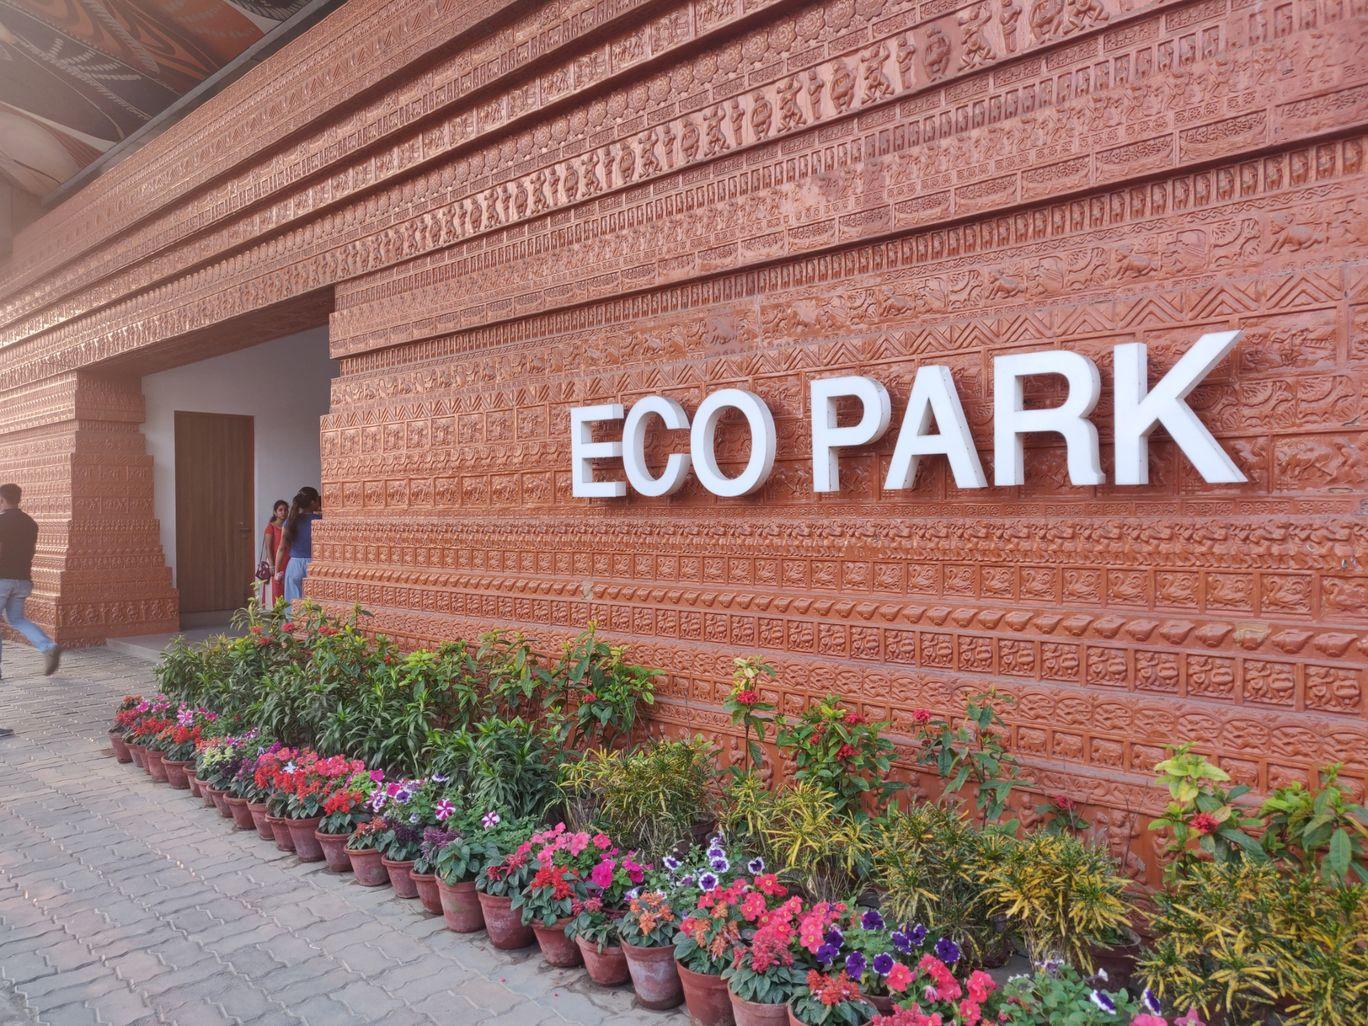 Photo of Eco Park By WanderWomania